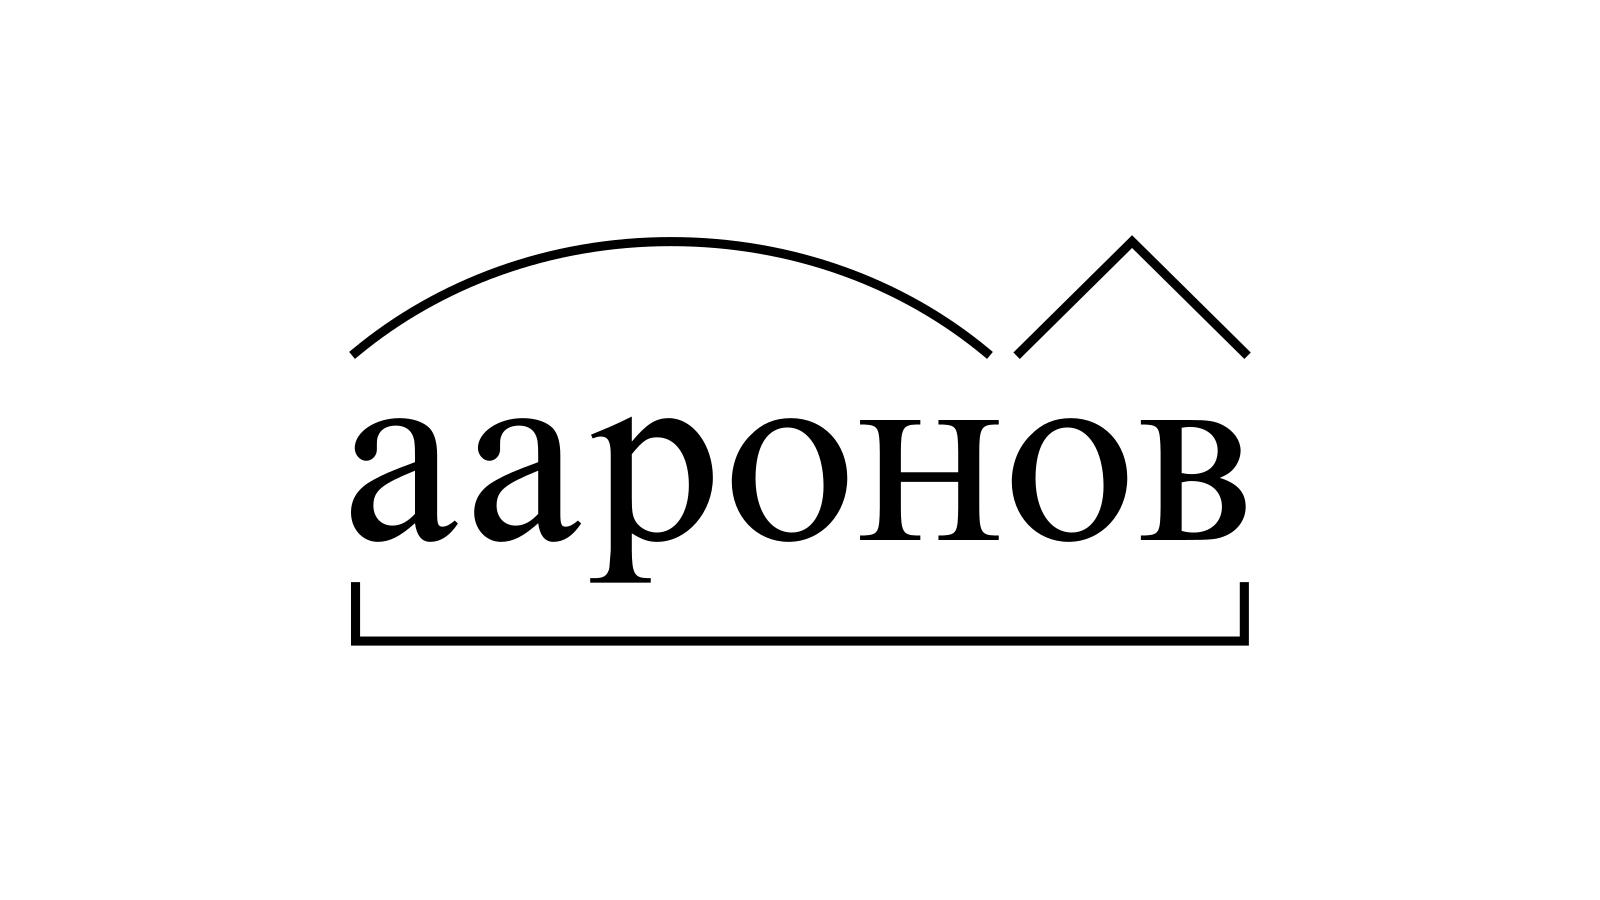 Разбор слова «ааронов» по составу